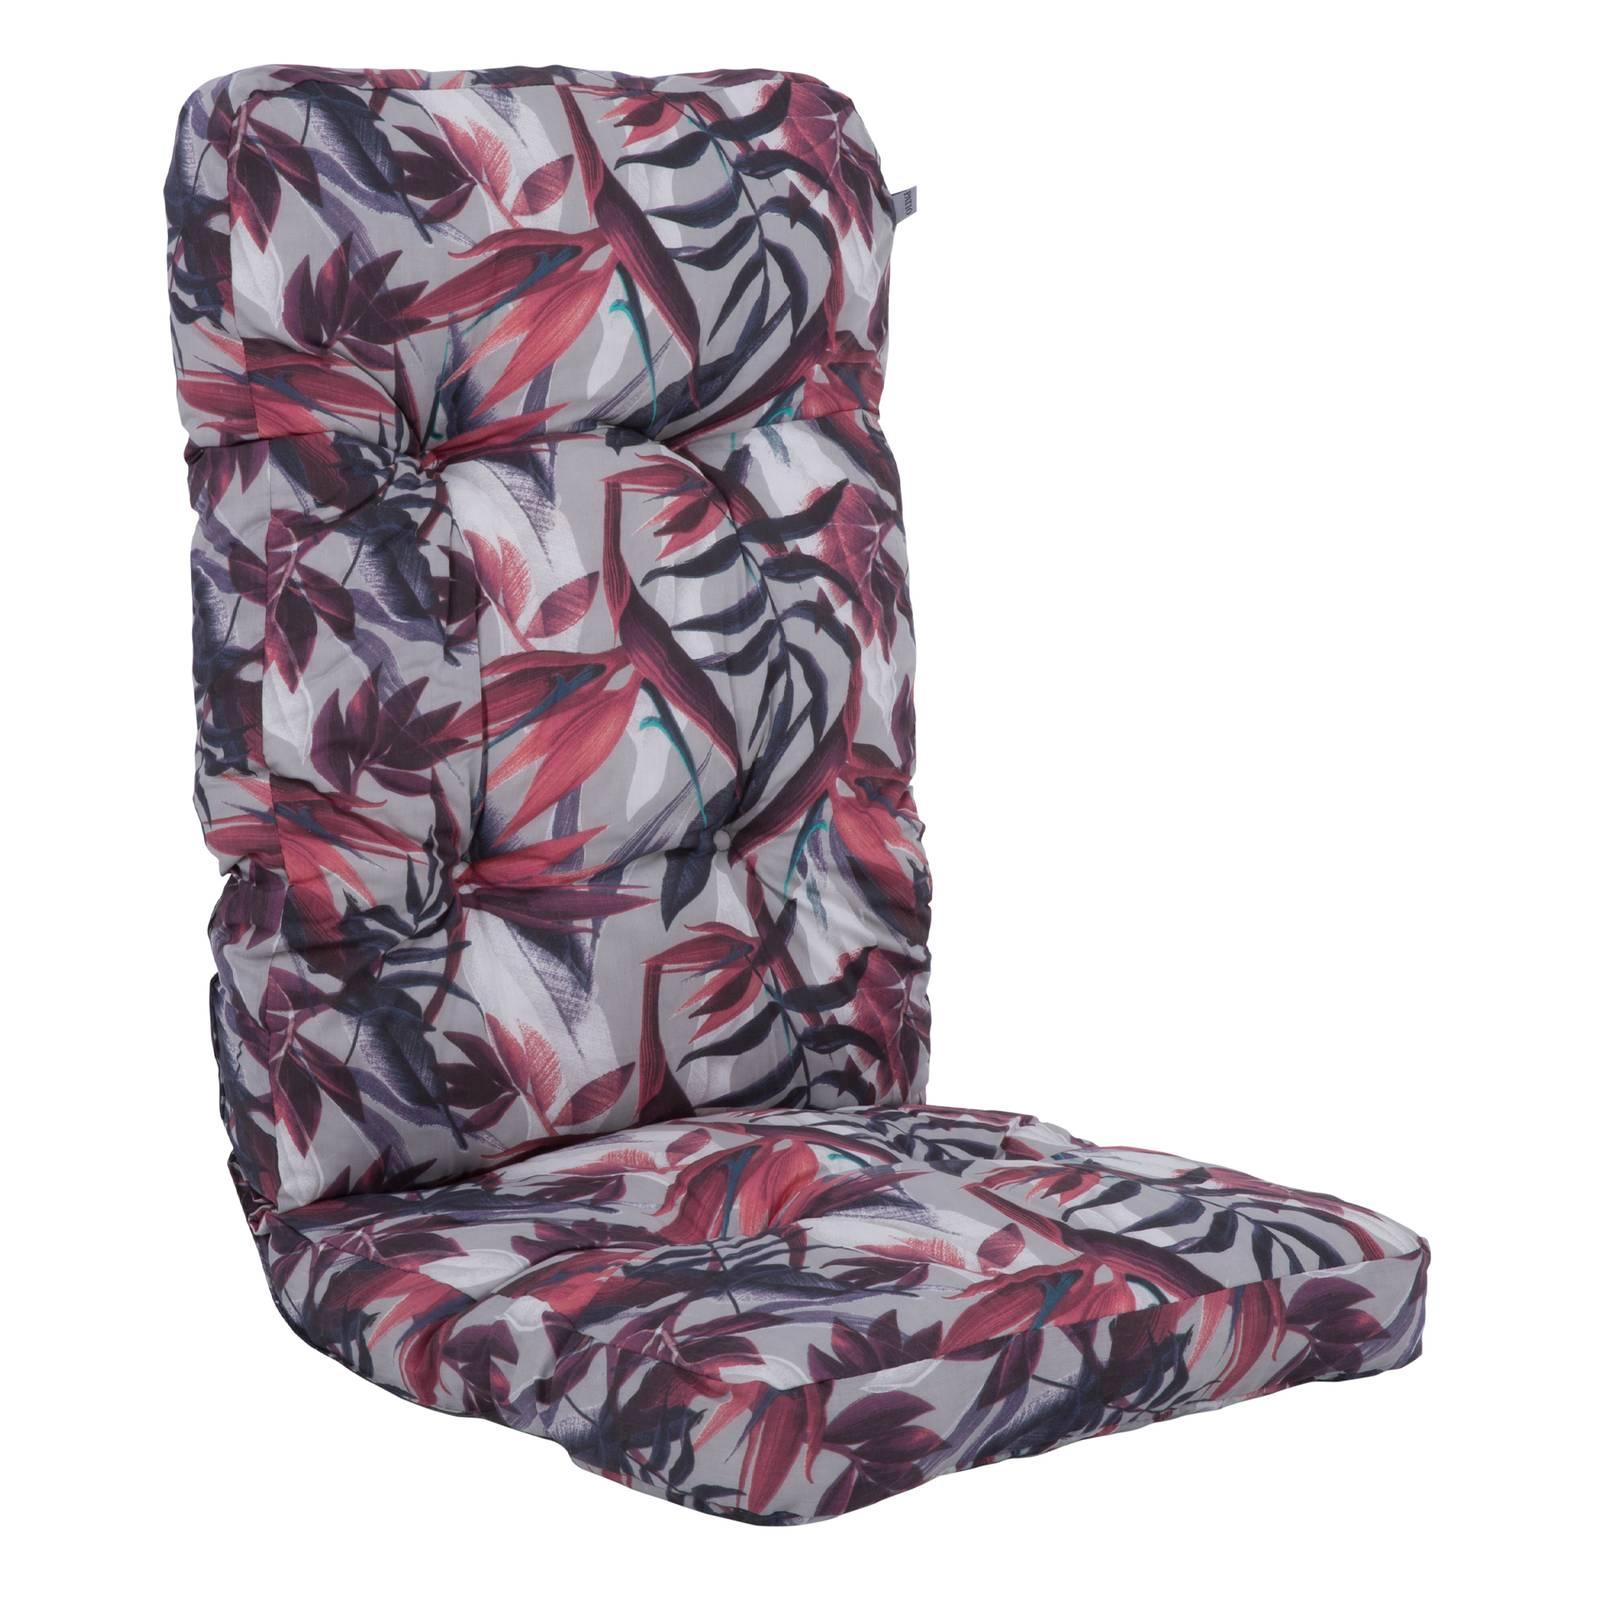 Poduszka na fotel Cordoba 8/10 cm A092-03PB PATIO